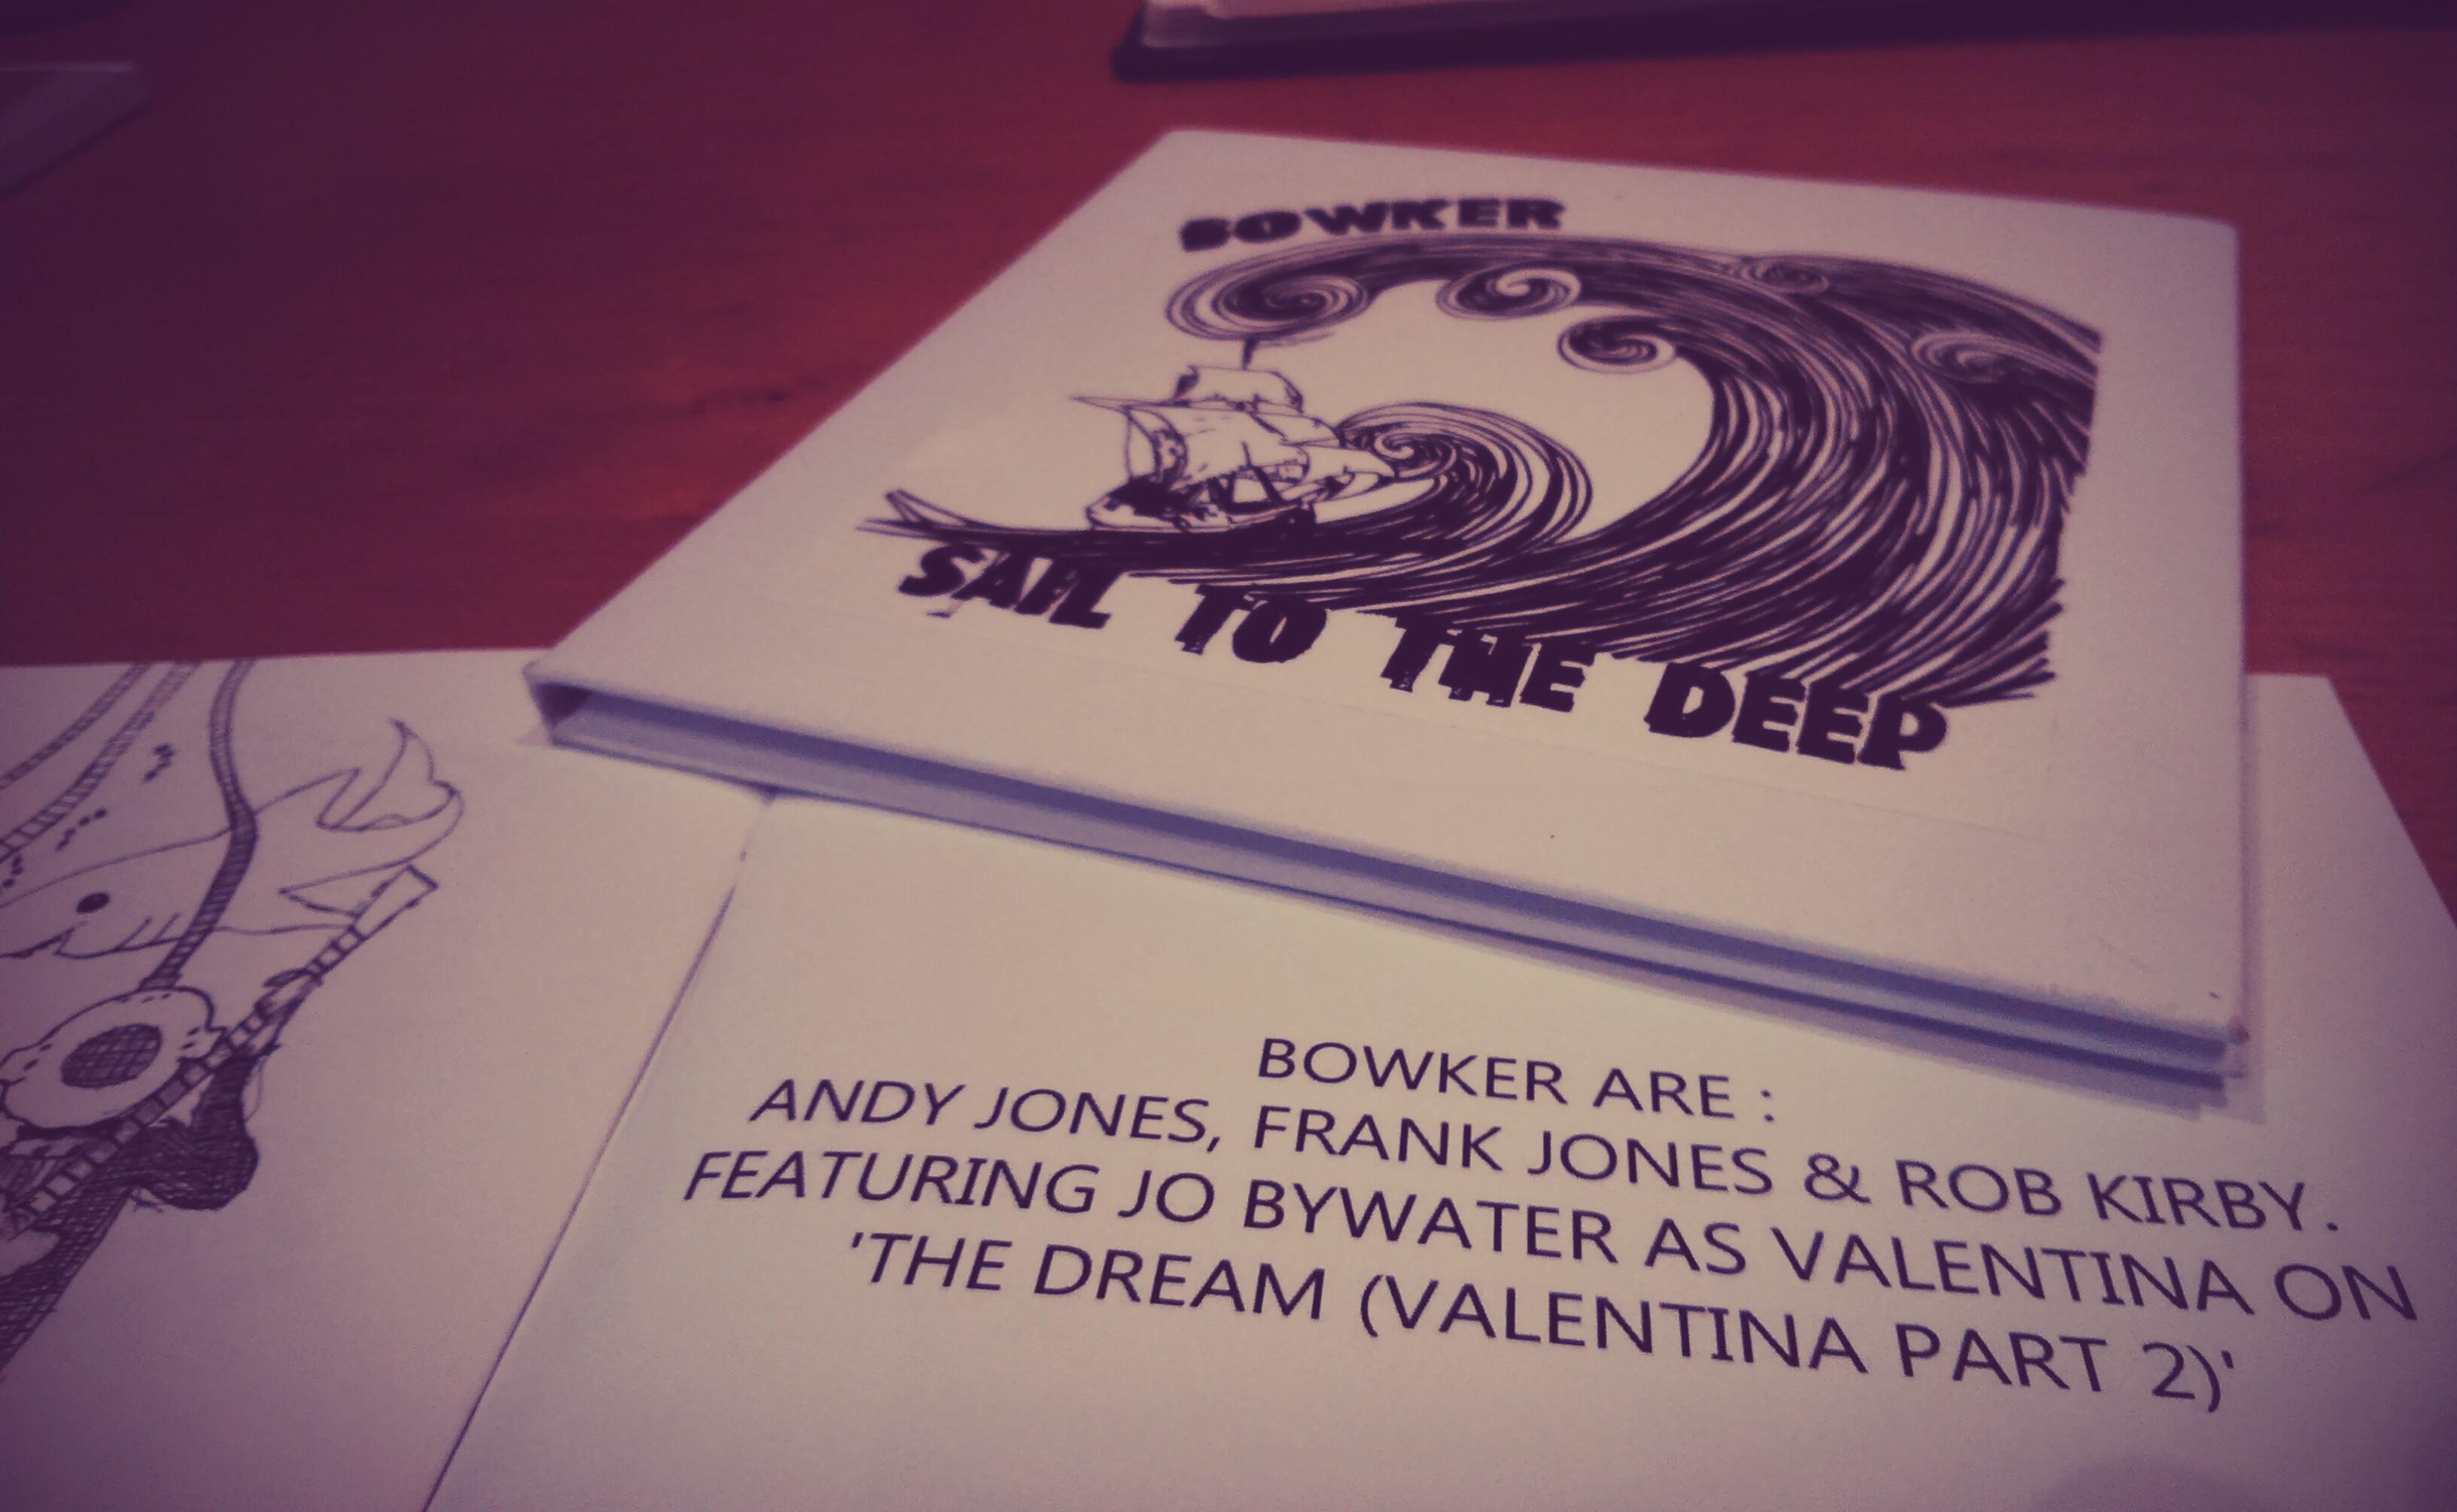 Bowker album sleeve